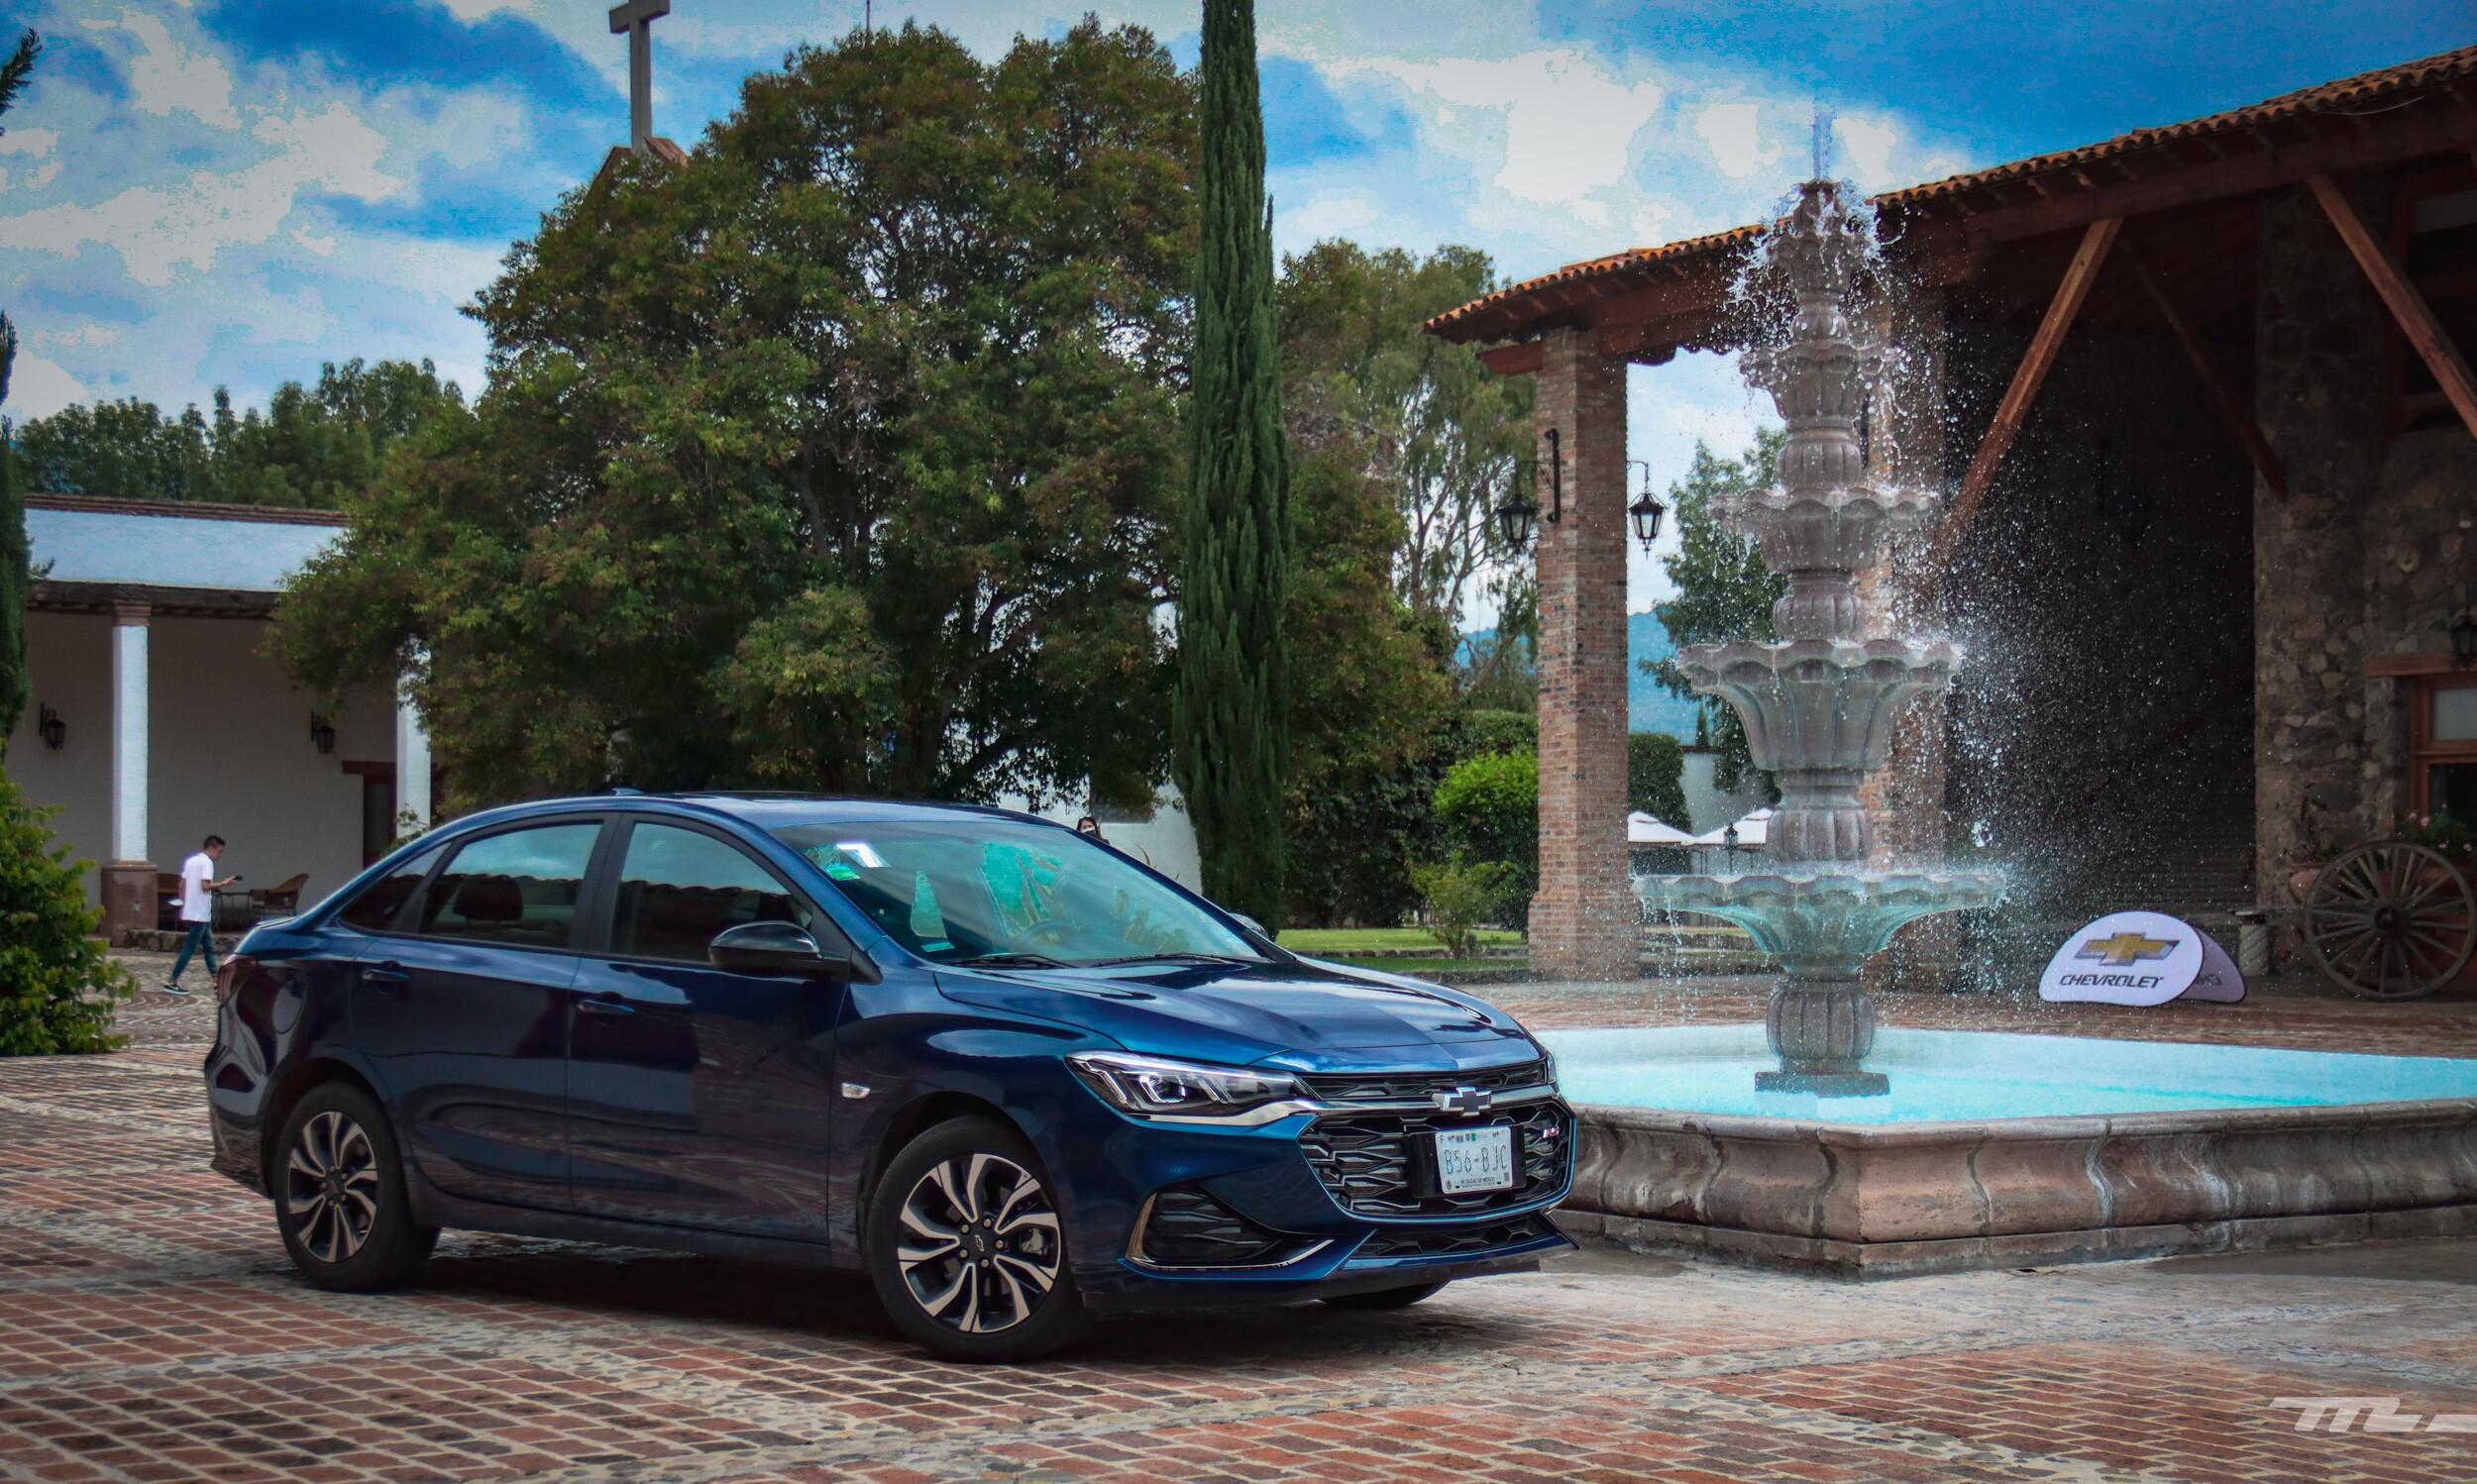 Foto de Chevrolet Cavalier Turbo 2022: Primer vistazo (4/37)